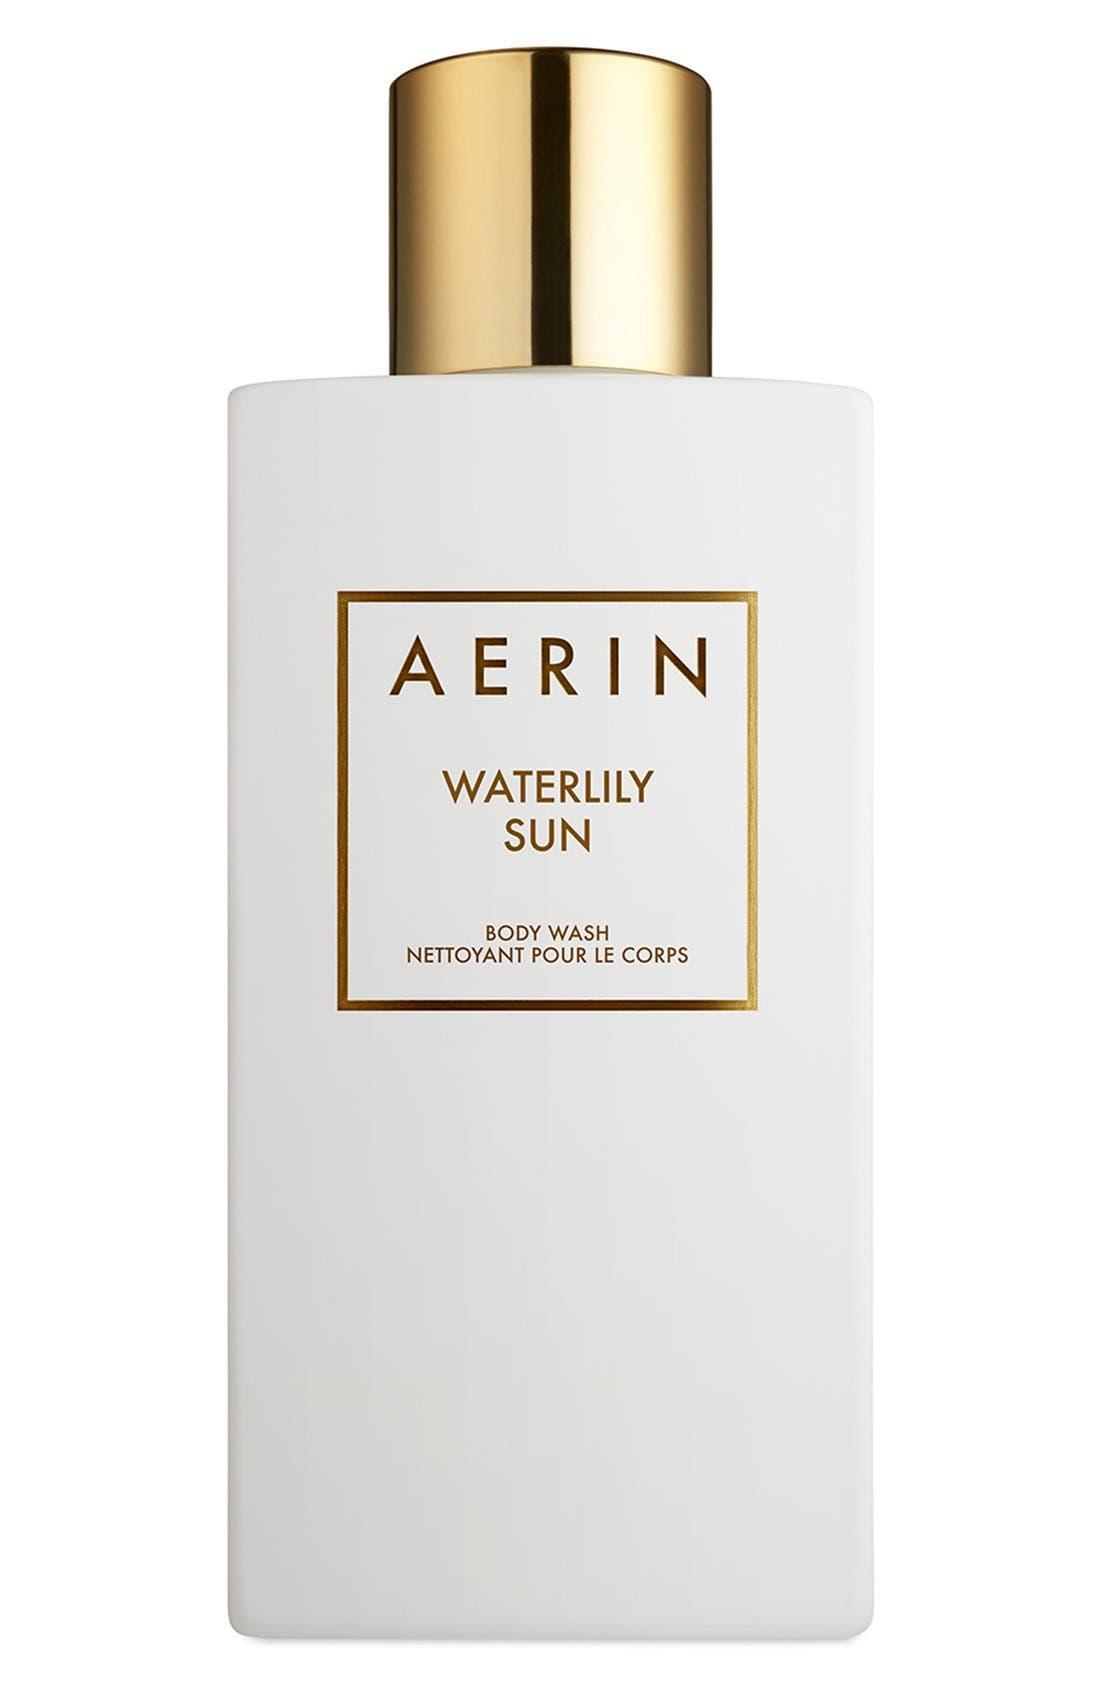 AERIN Beauty Waterlily Sun Body Wash,                             Main thumbnail 1, color,                             000